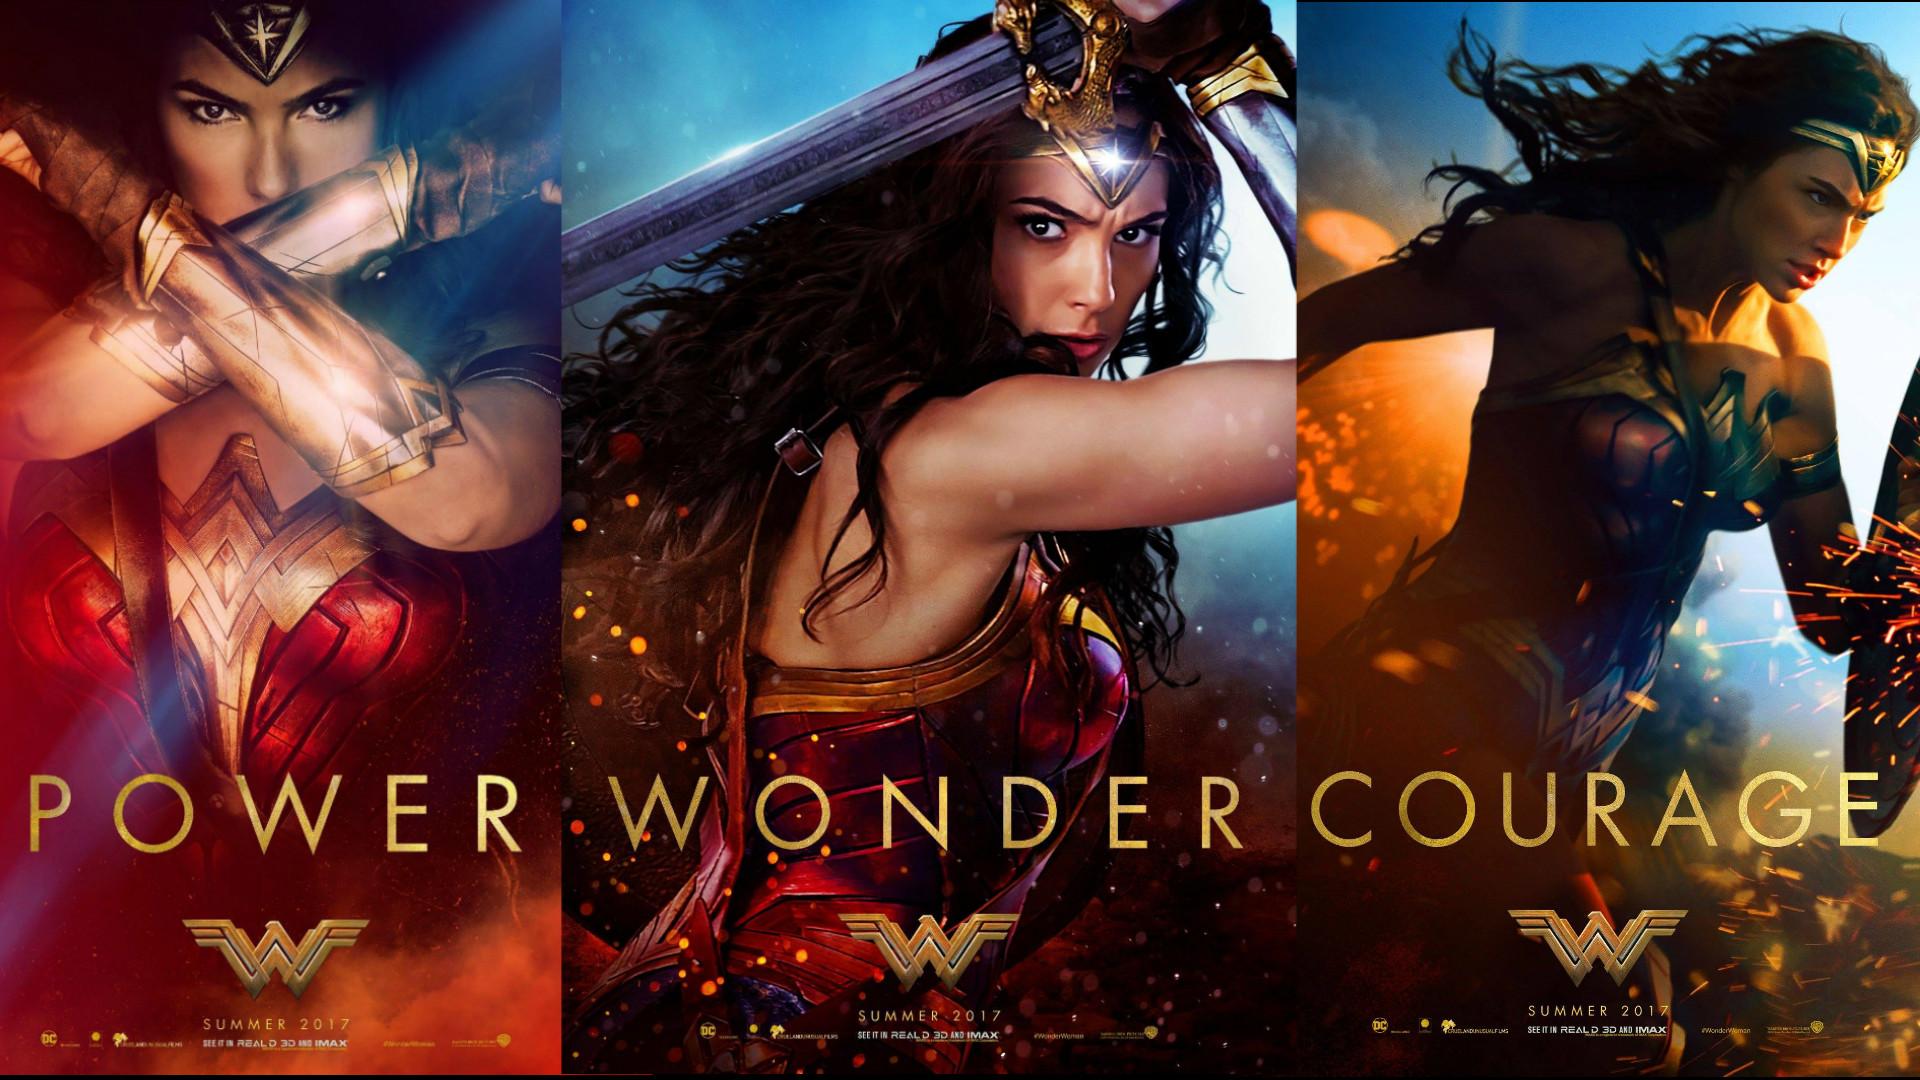 Wonder Woman 7 Movie Wallpapers: Wonder Woman Logo Wallpaper (61+ Images